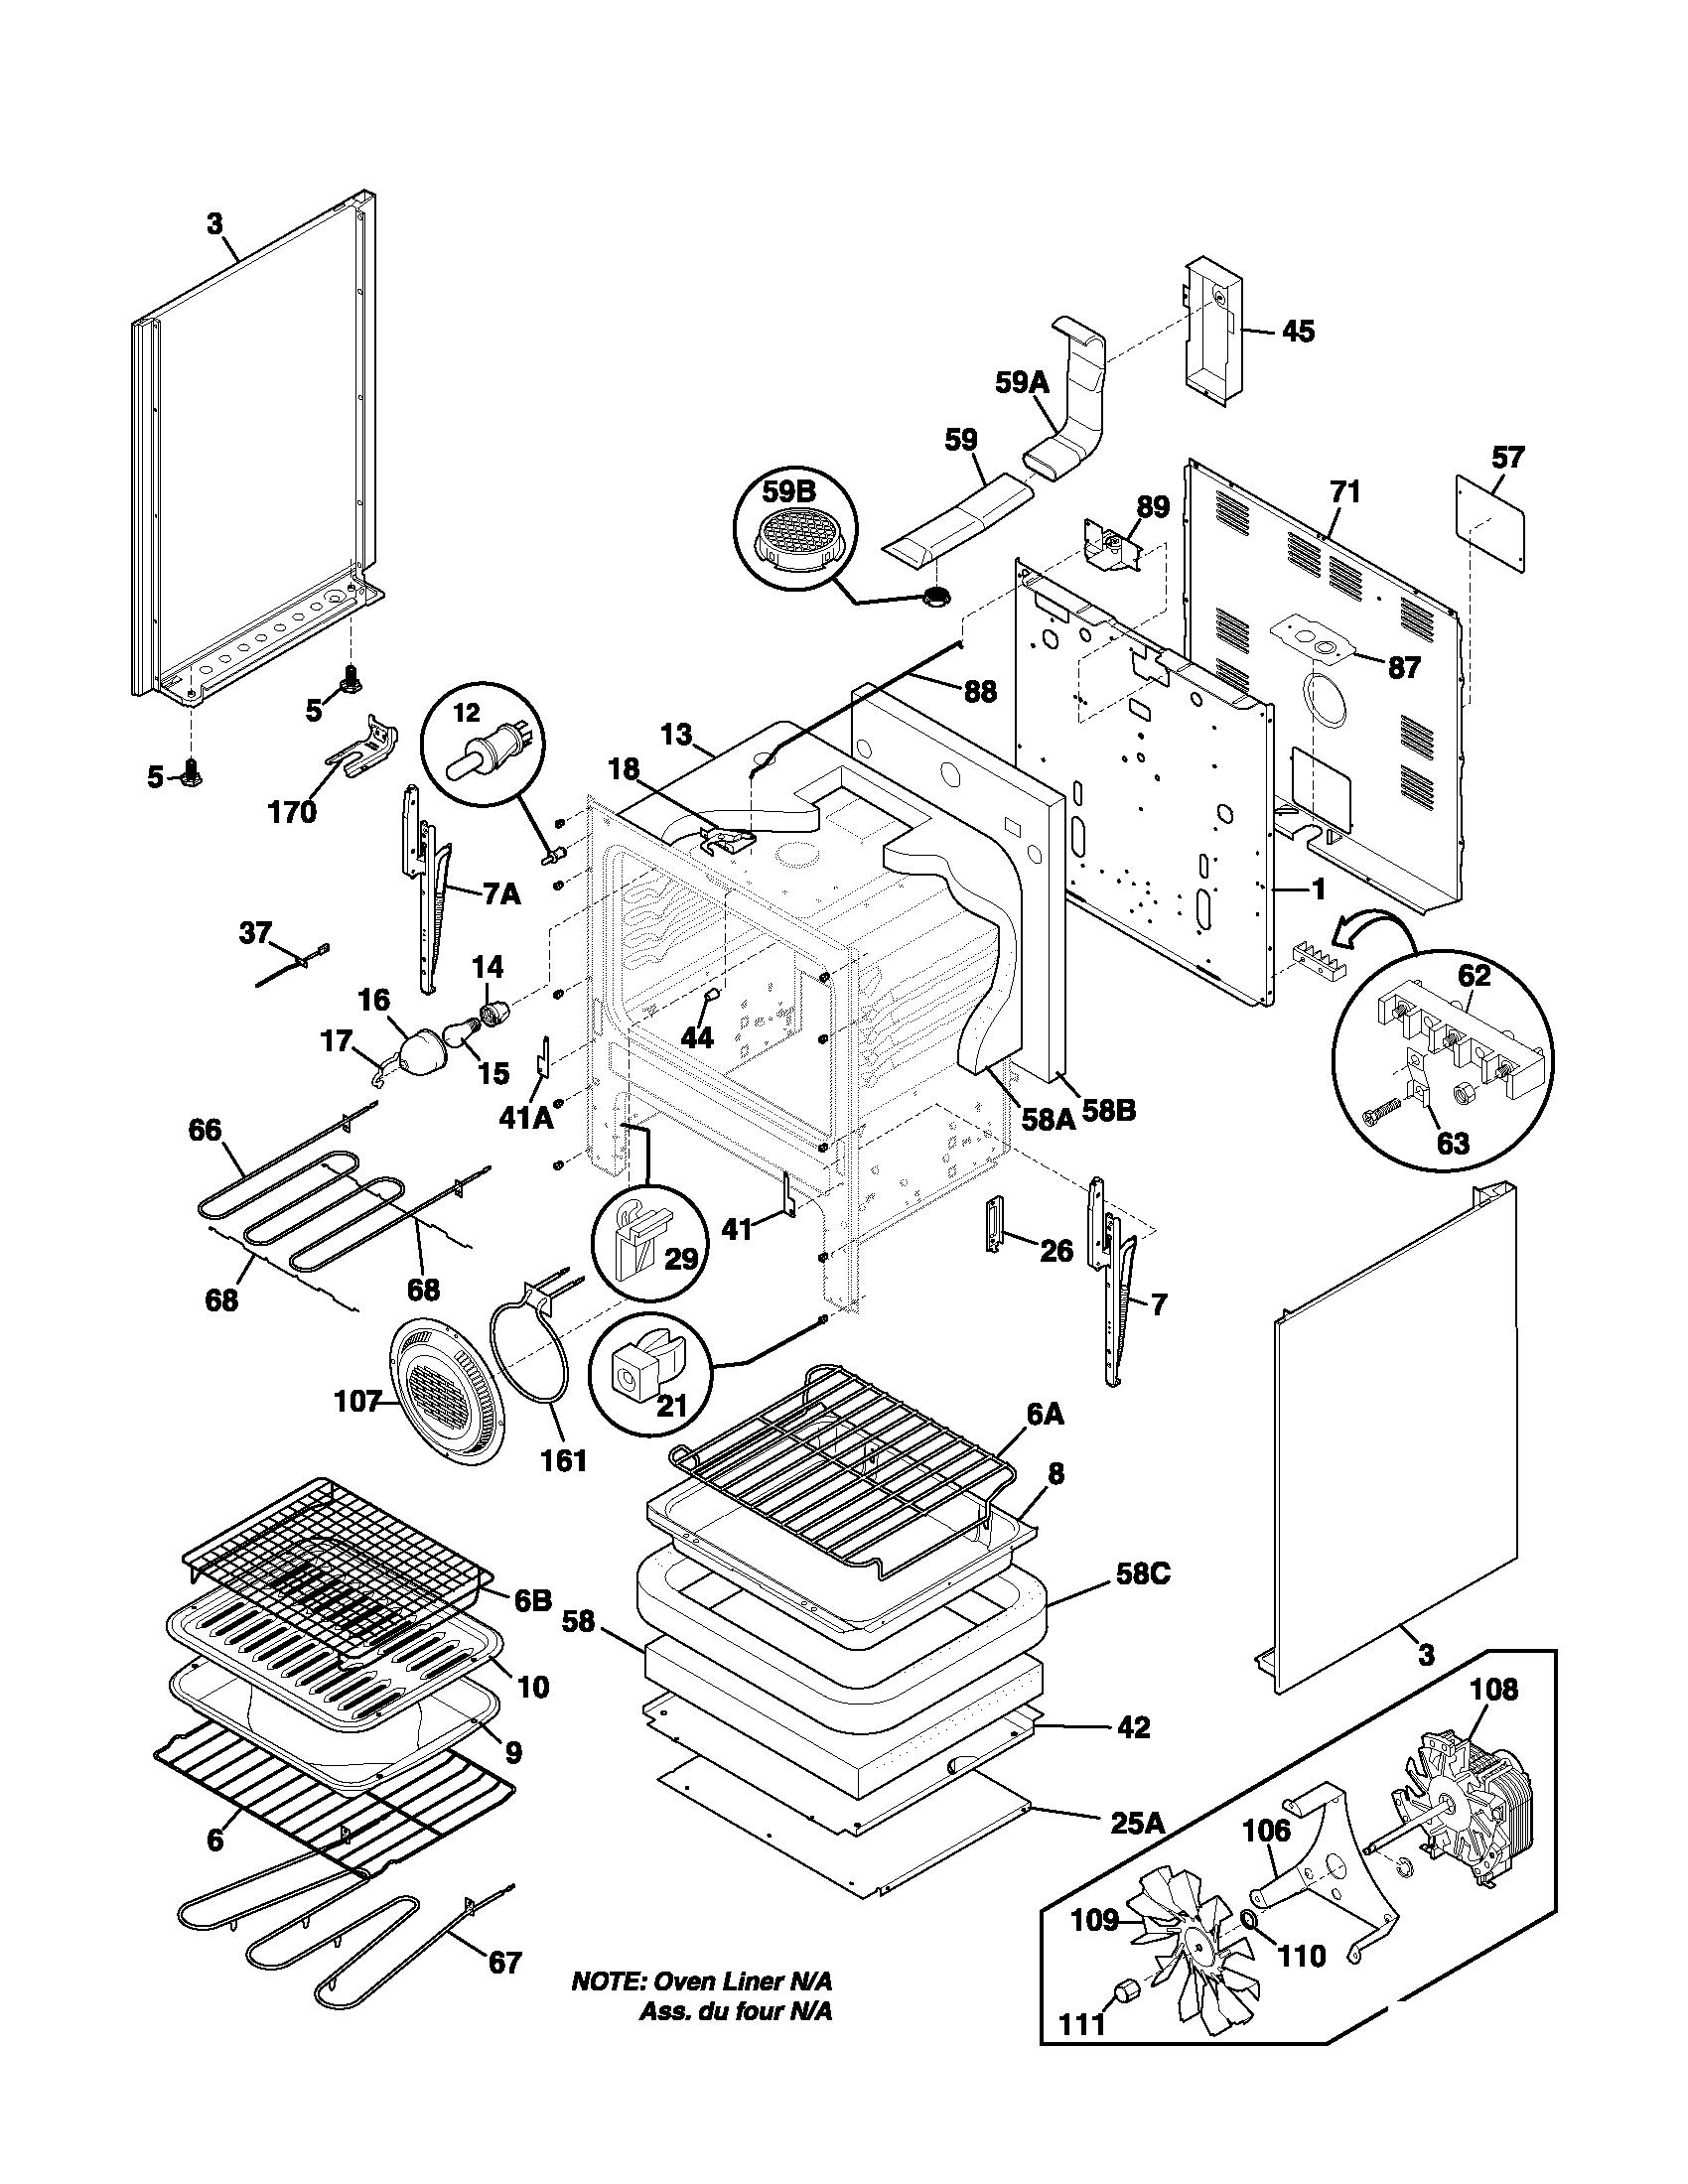 grieve oven wiring diagram